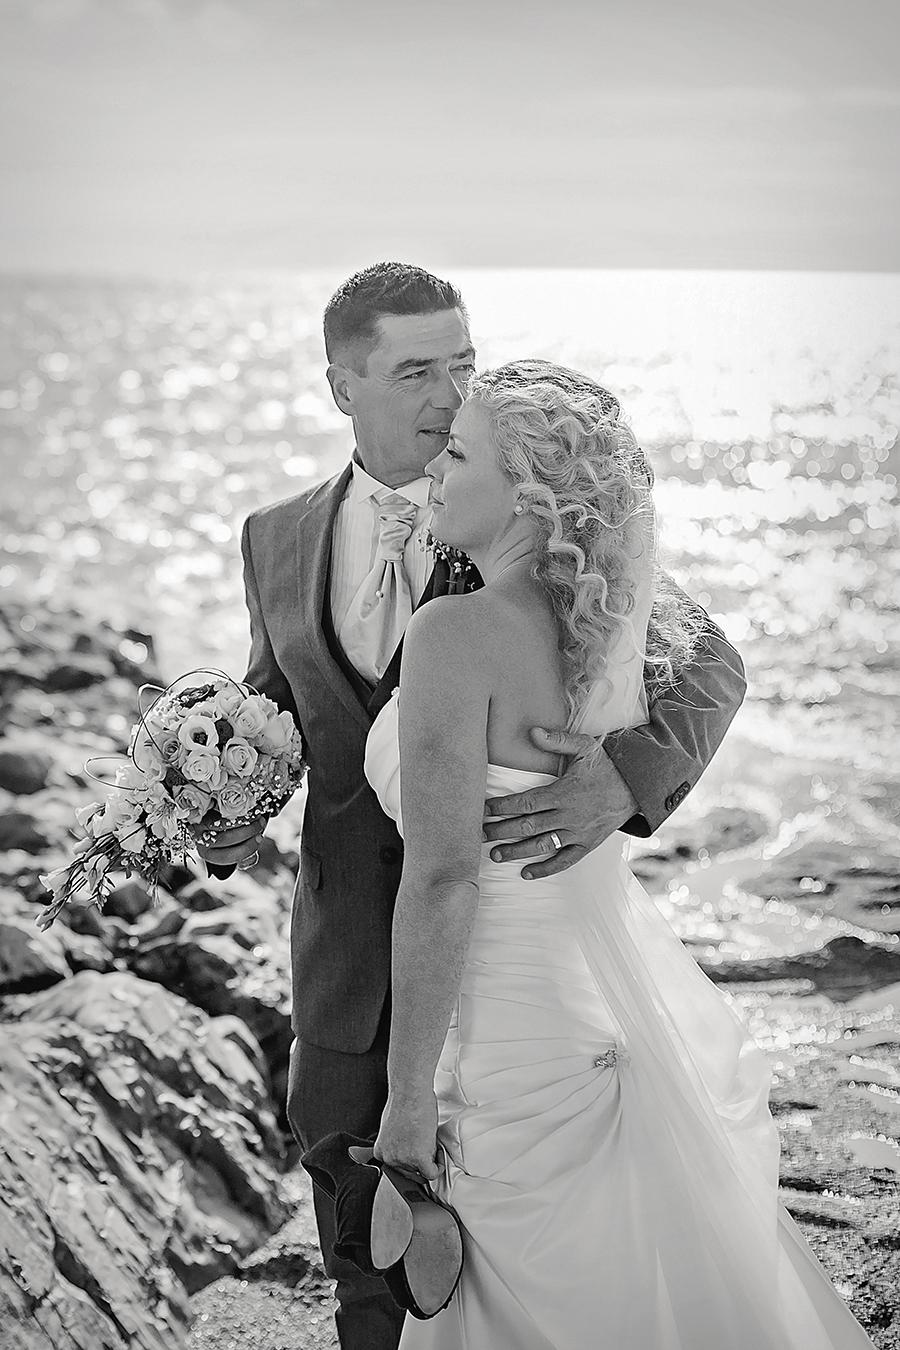 Adam Annowi Wedding photography